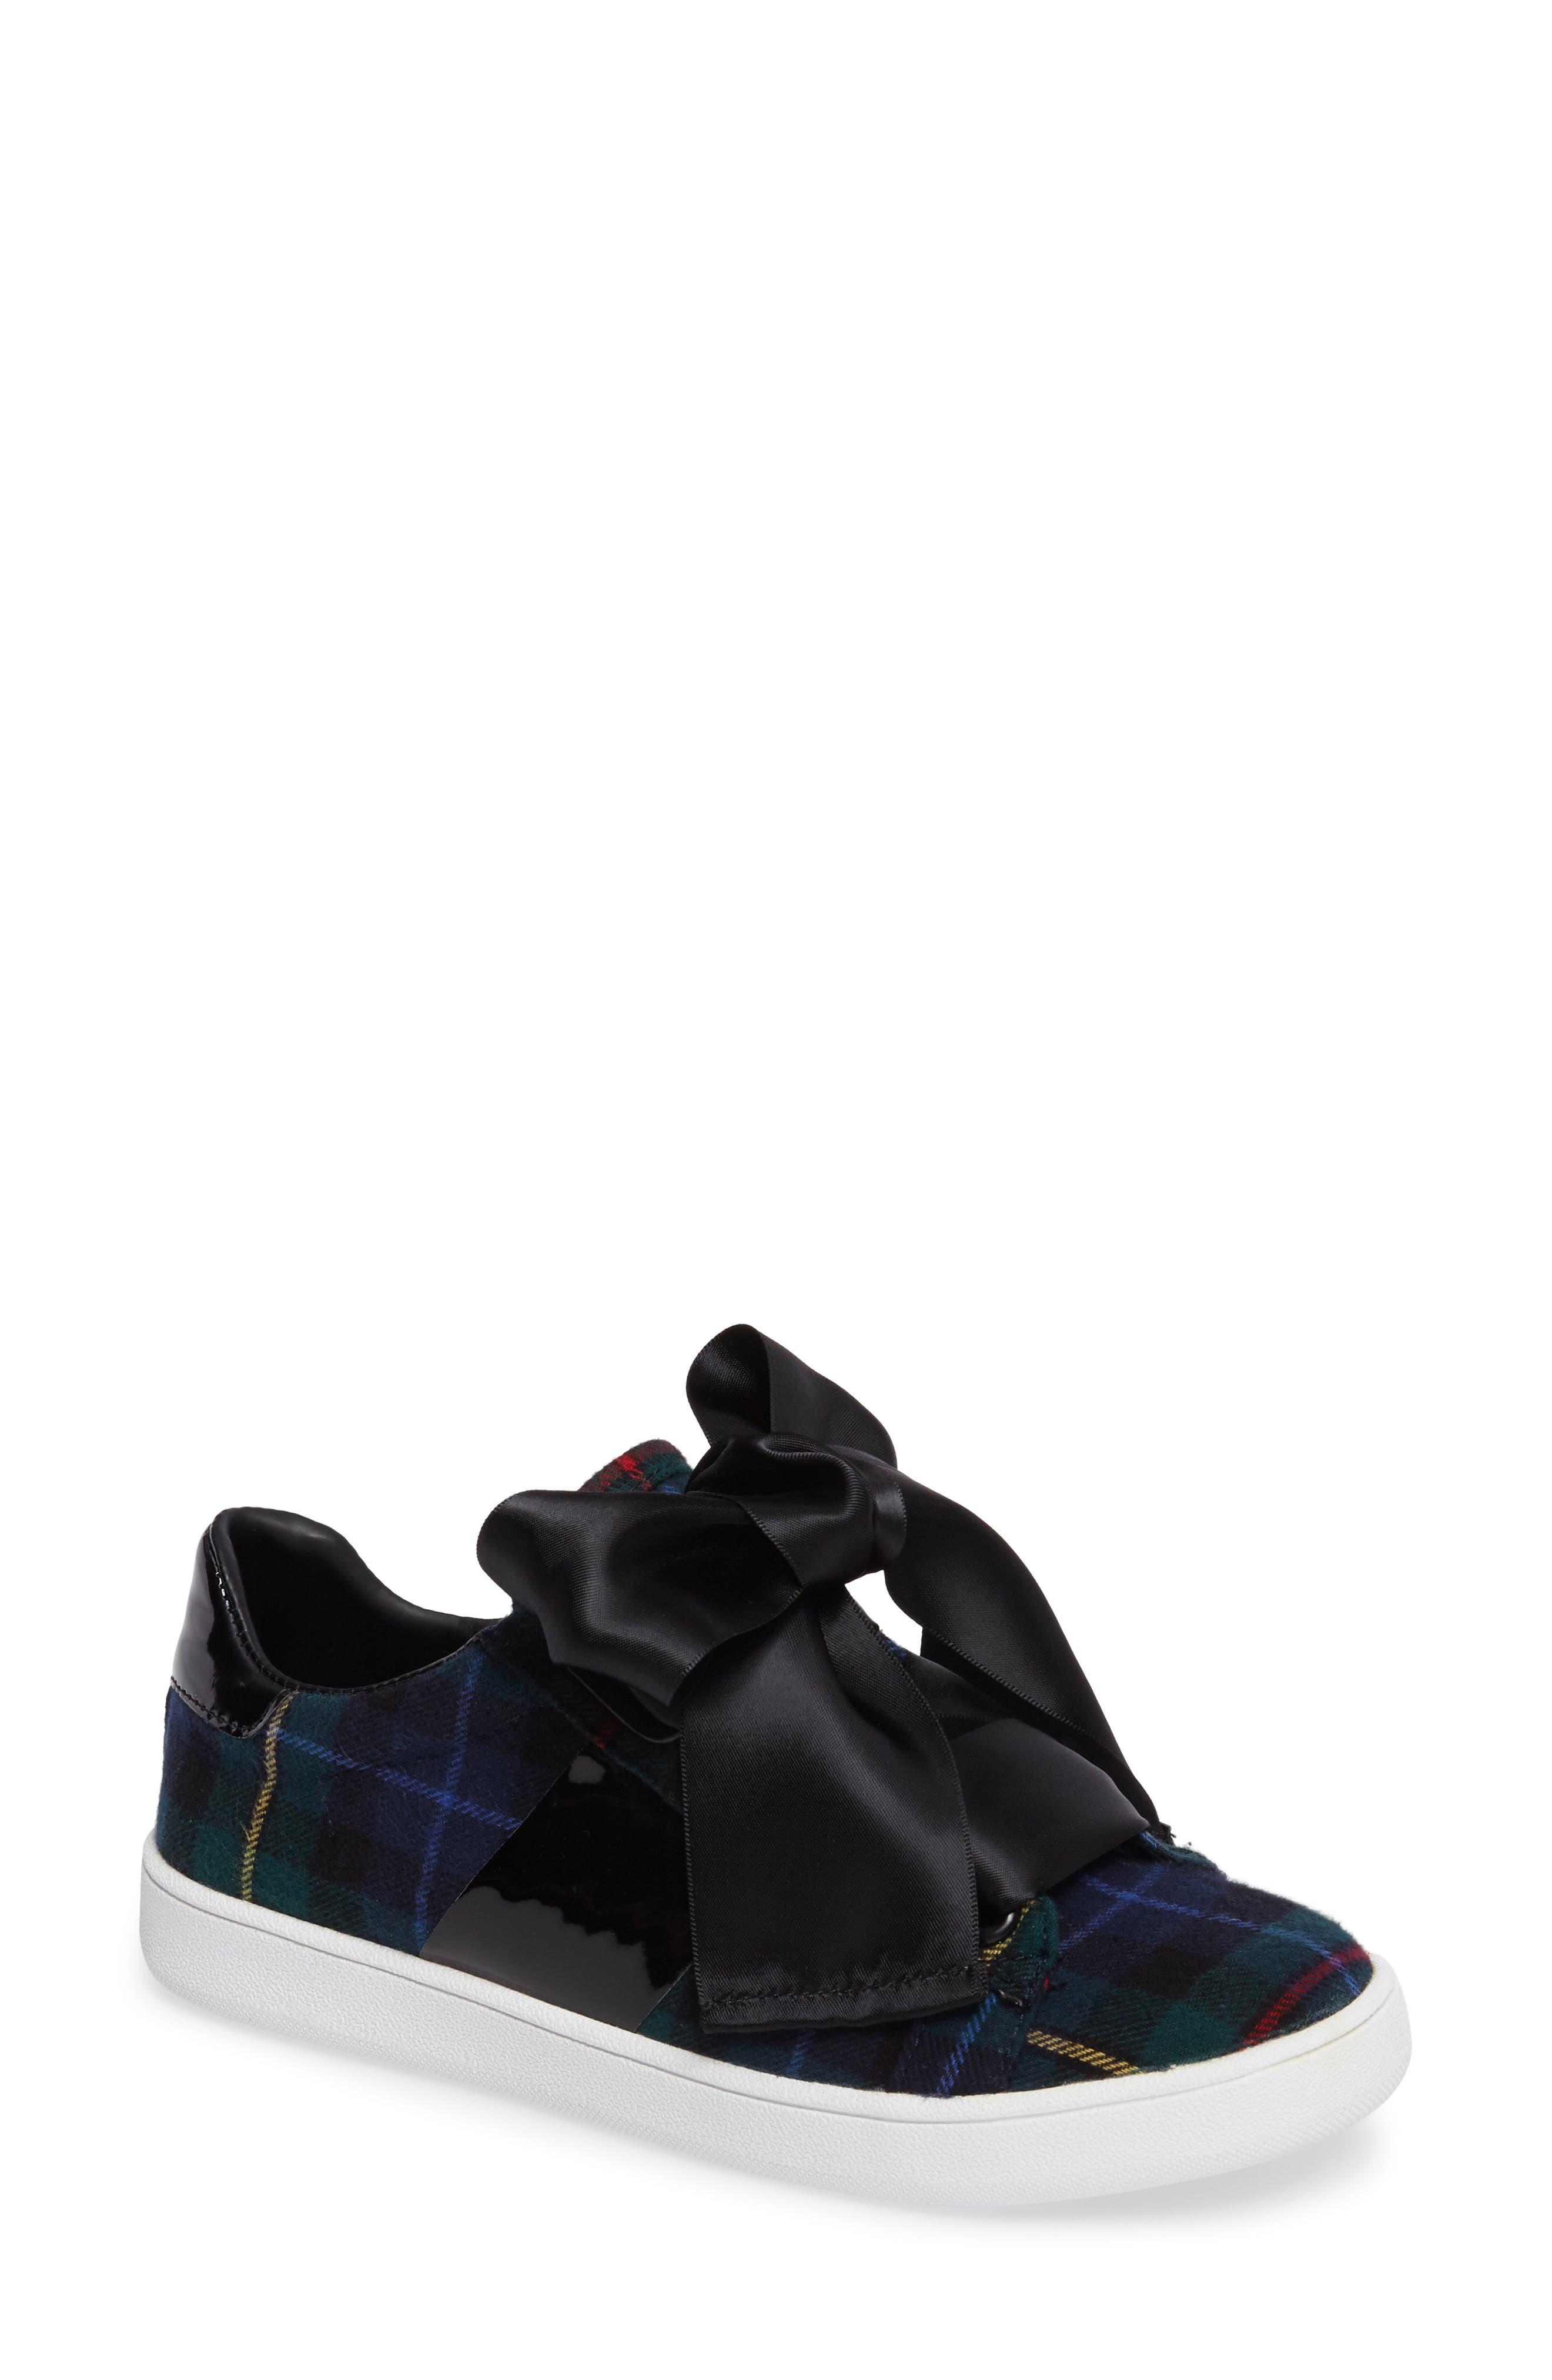 Pabst Low-Top Sneaker,                             Main thumbnail 6, color,